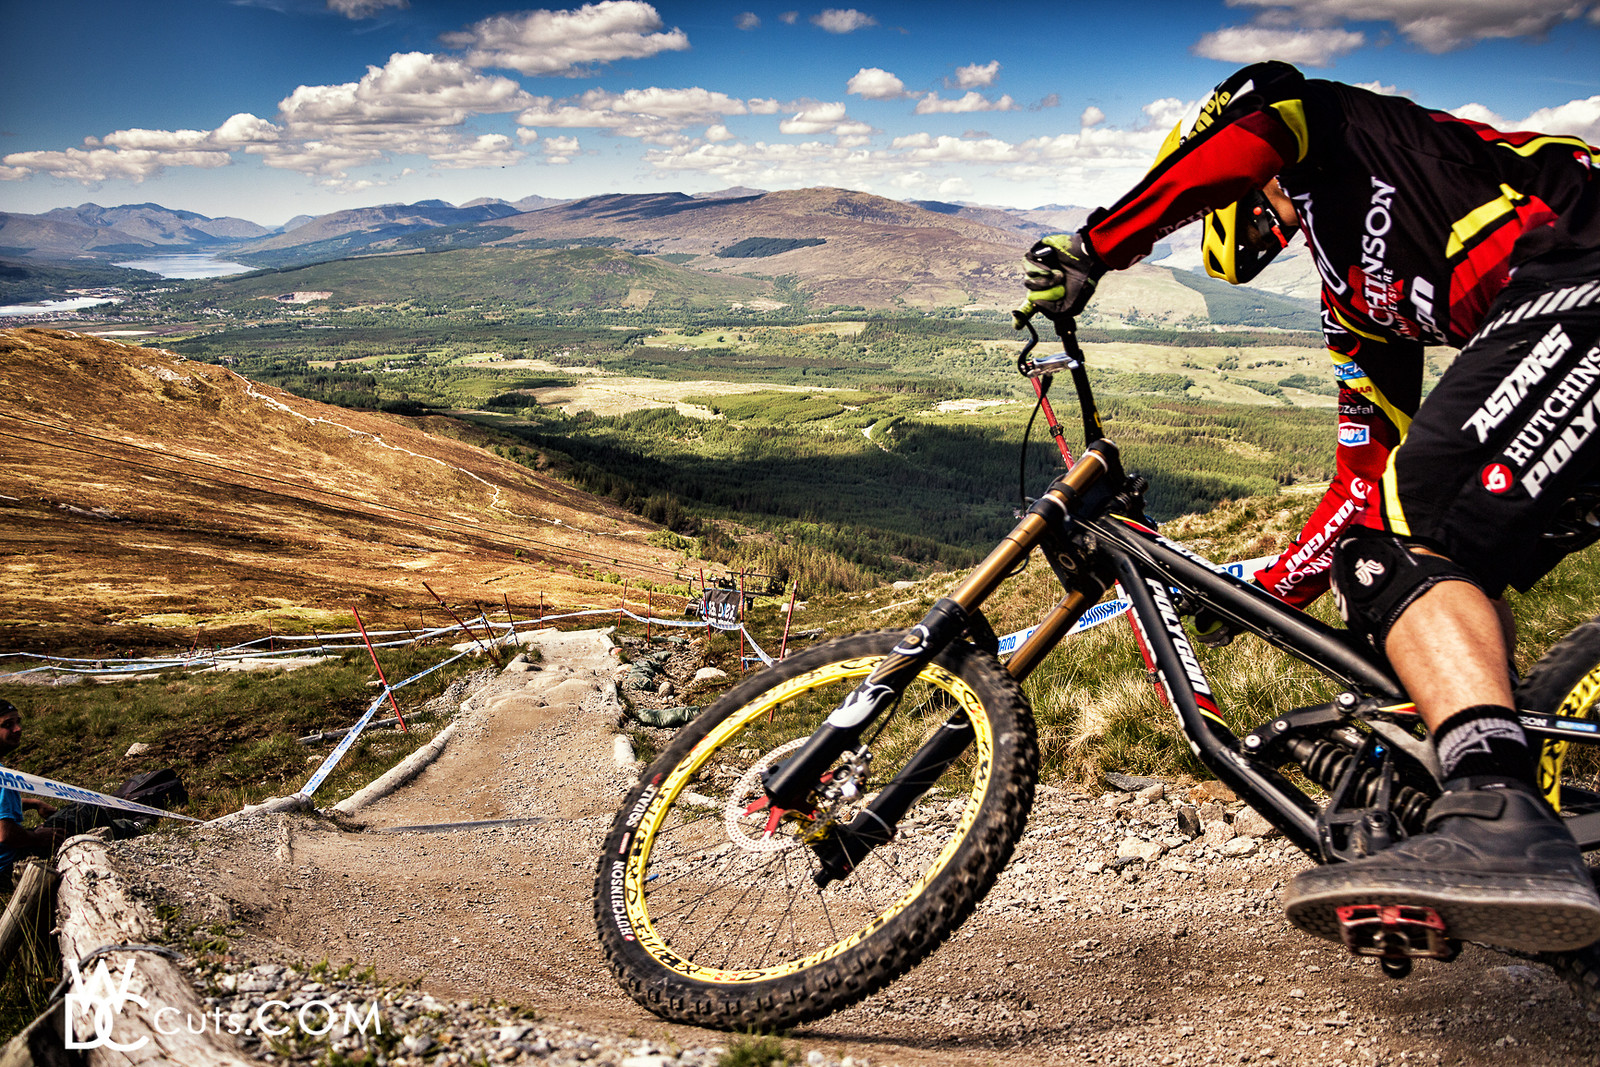 top - Wayne DC - Mountain Biking Pictures - Vital MTB